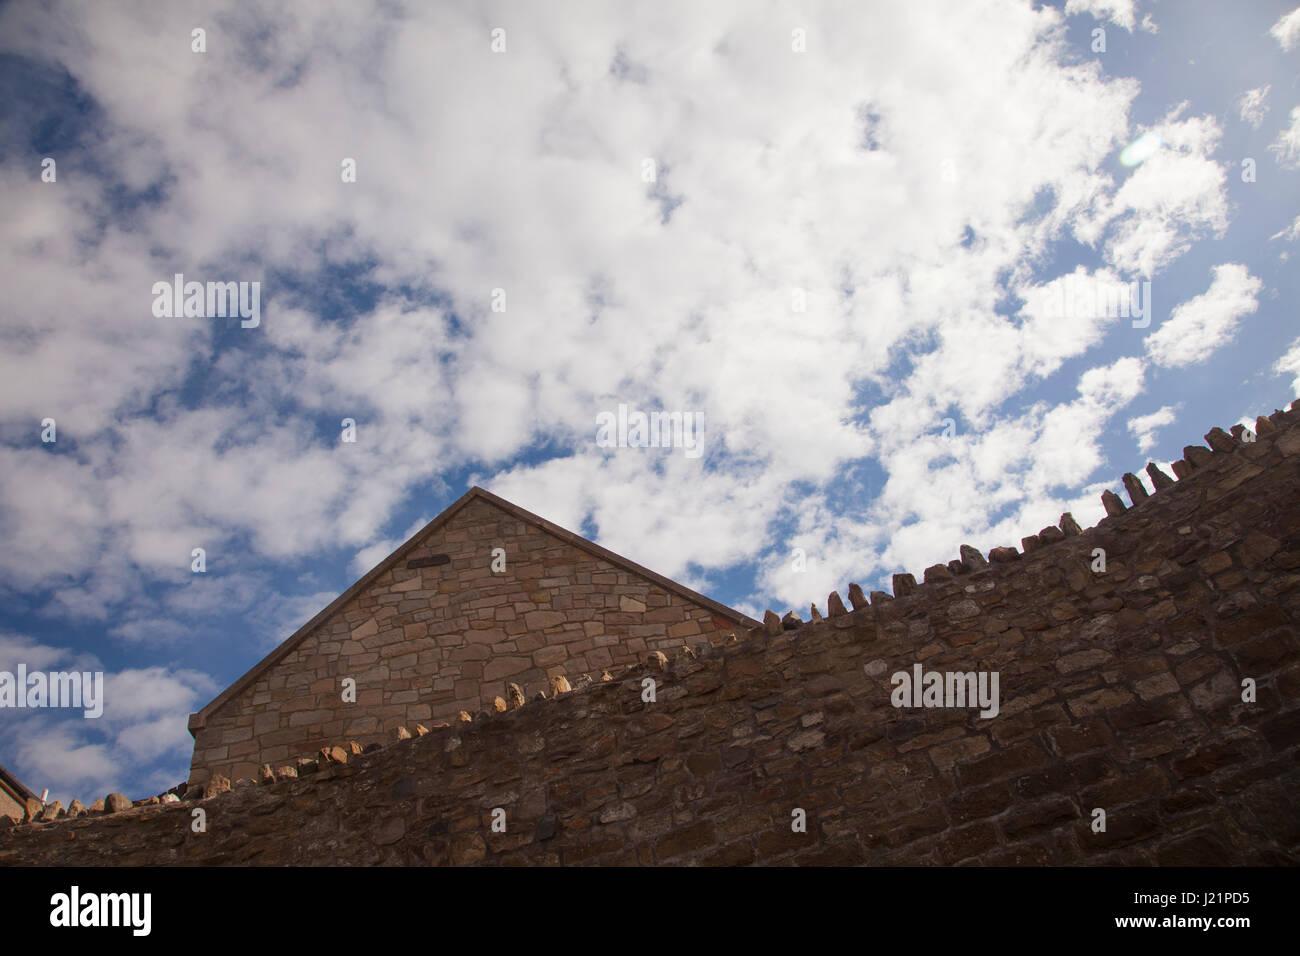 Edinburgh, Scotland, UK. 23rd Apr, 2017. Wide view of the stone houses on the shore of Prestonpans near Edinburgh - Stock Image